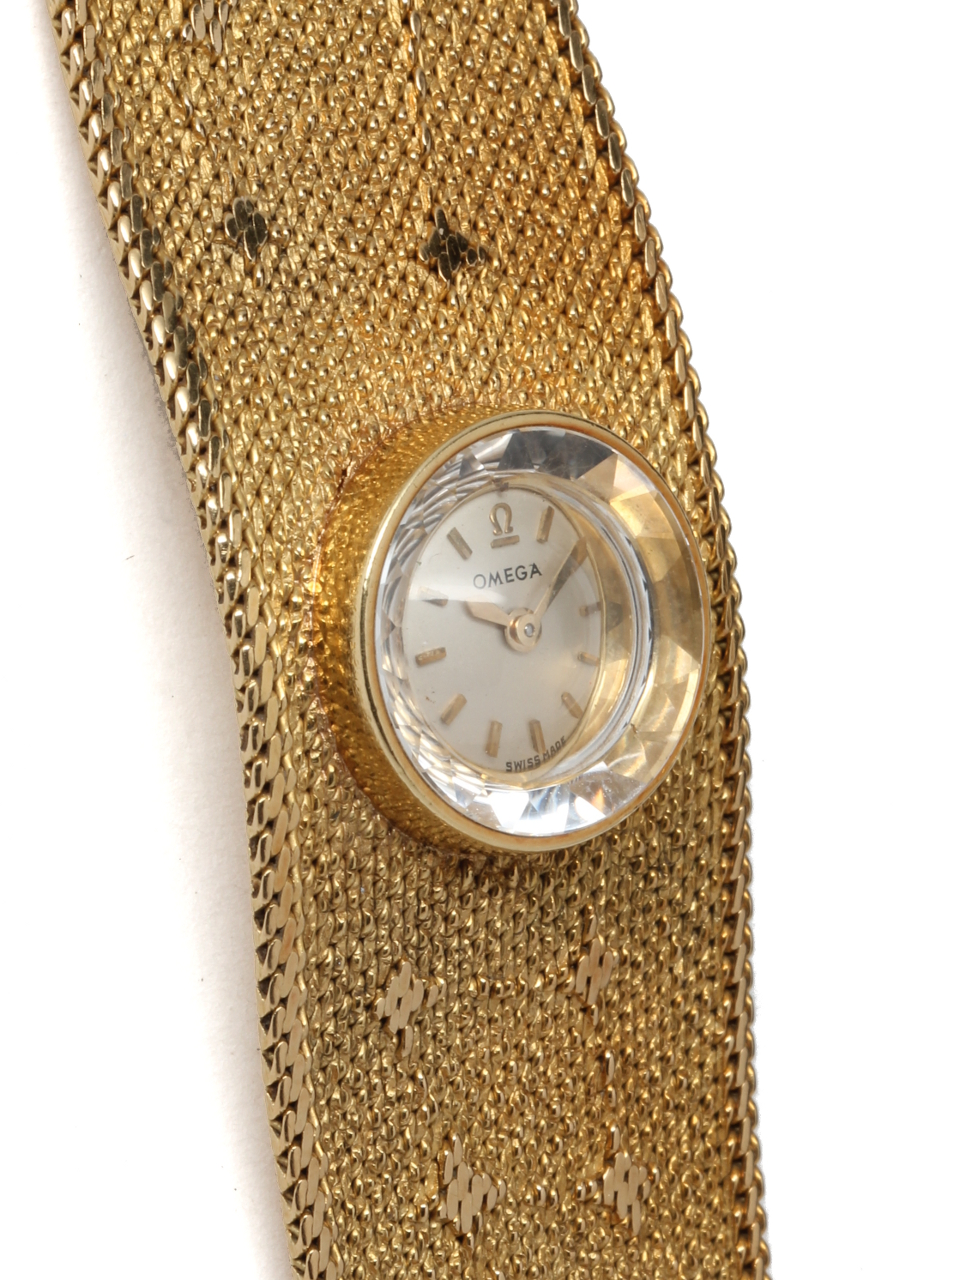 Wanna Buy A Watch Omega 18K YG Astronomy Theme Circa